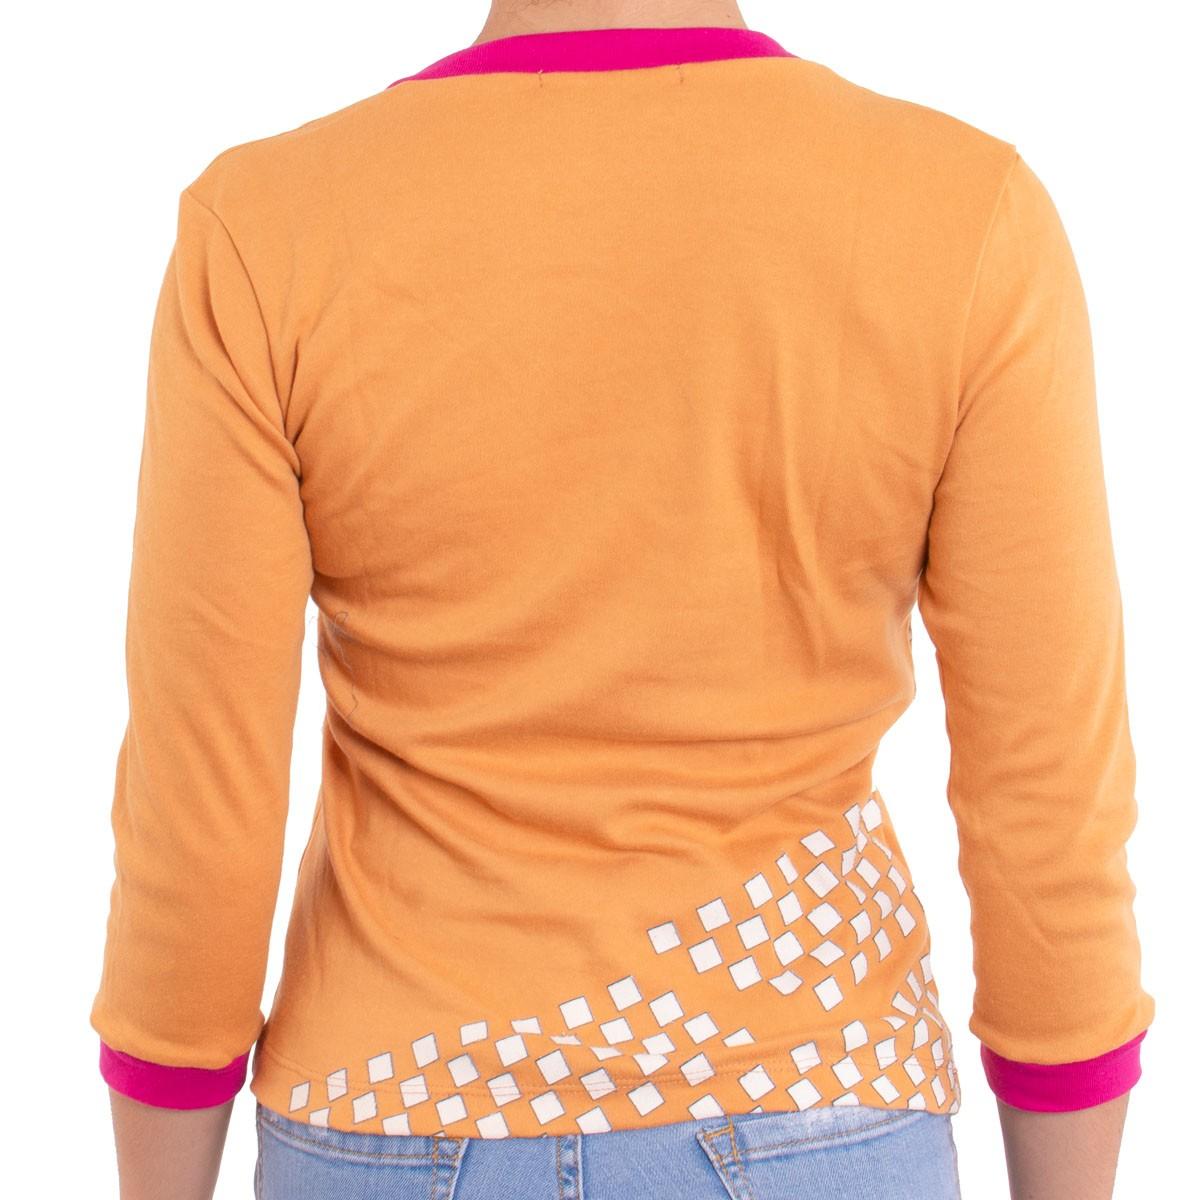 Camiseta Feminina 3/4 Transportadora  -